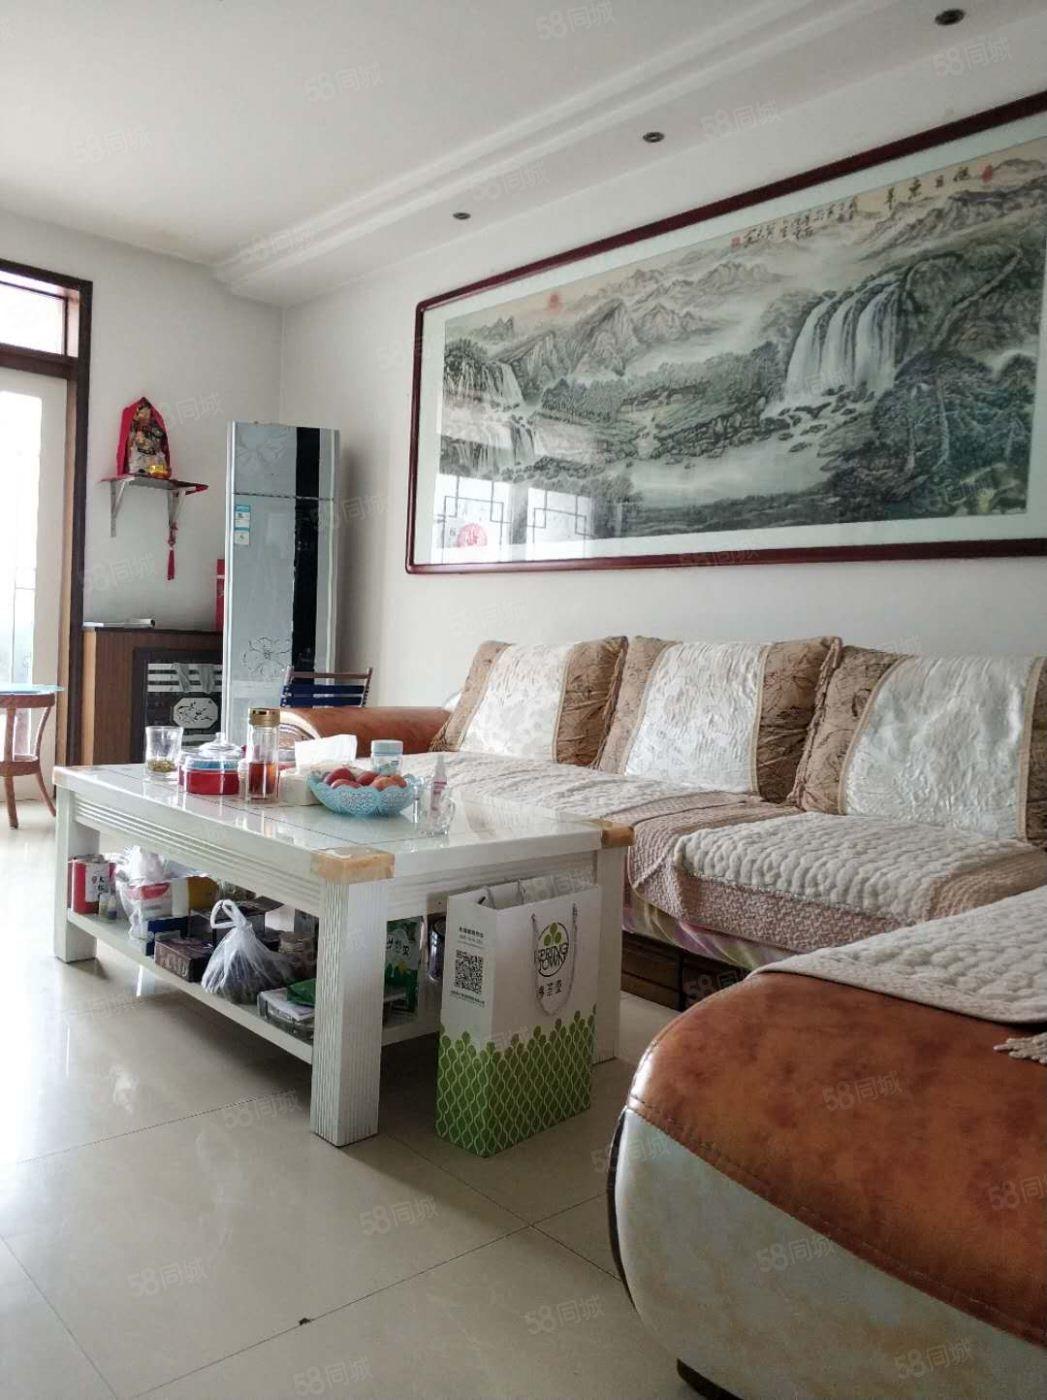 b东风路长青小区临进咸阳二中塔尔坡学校两室中等装修